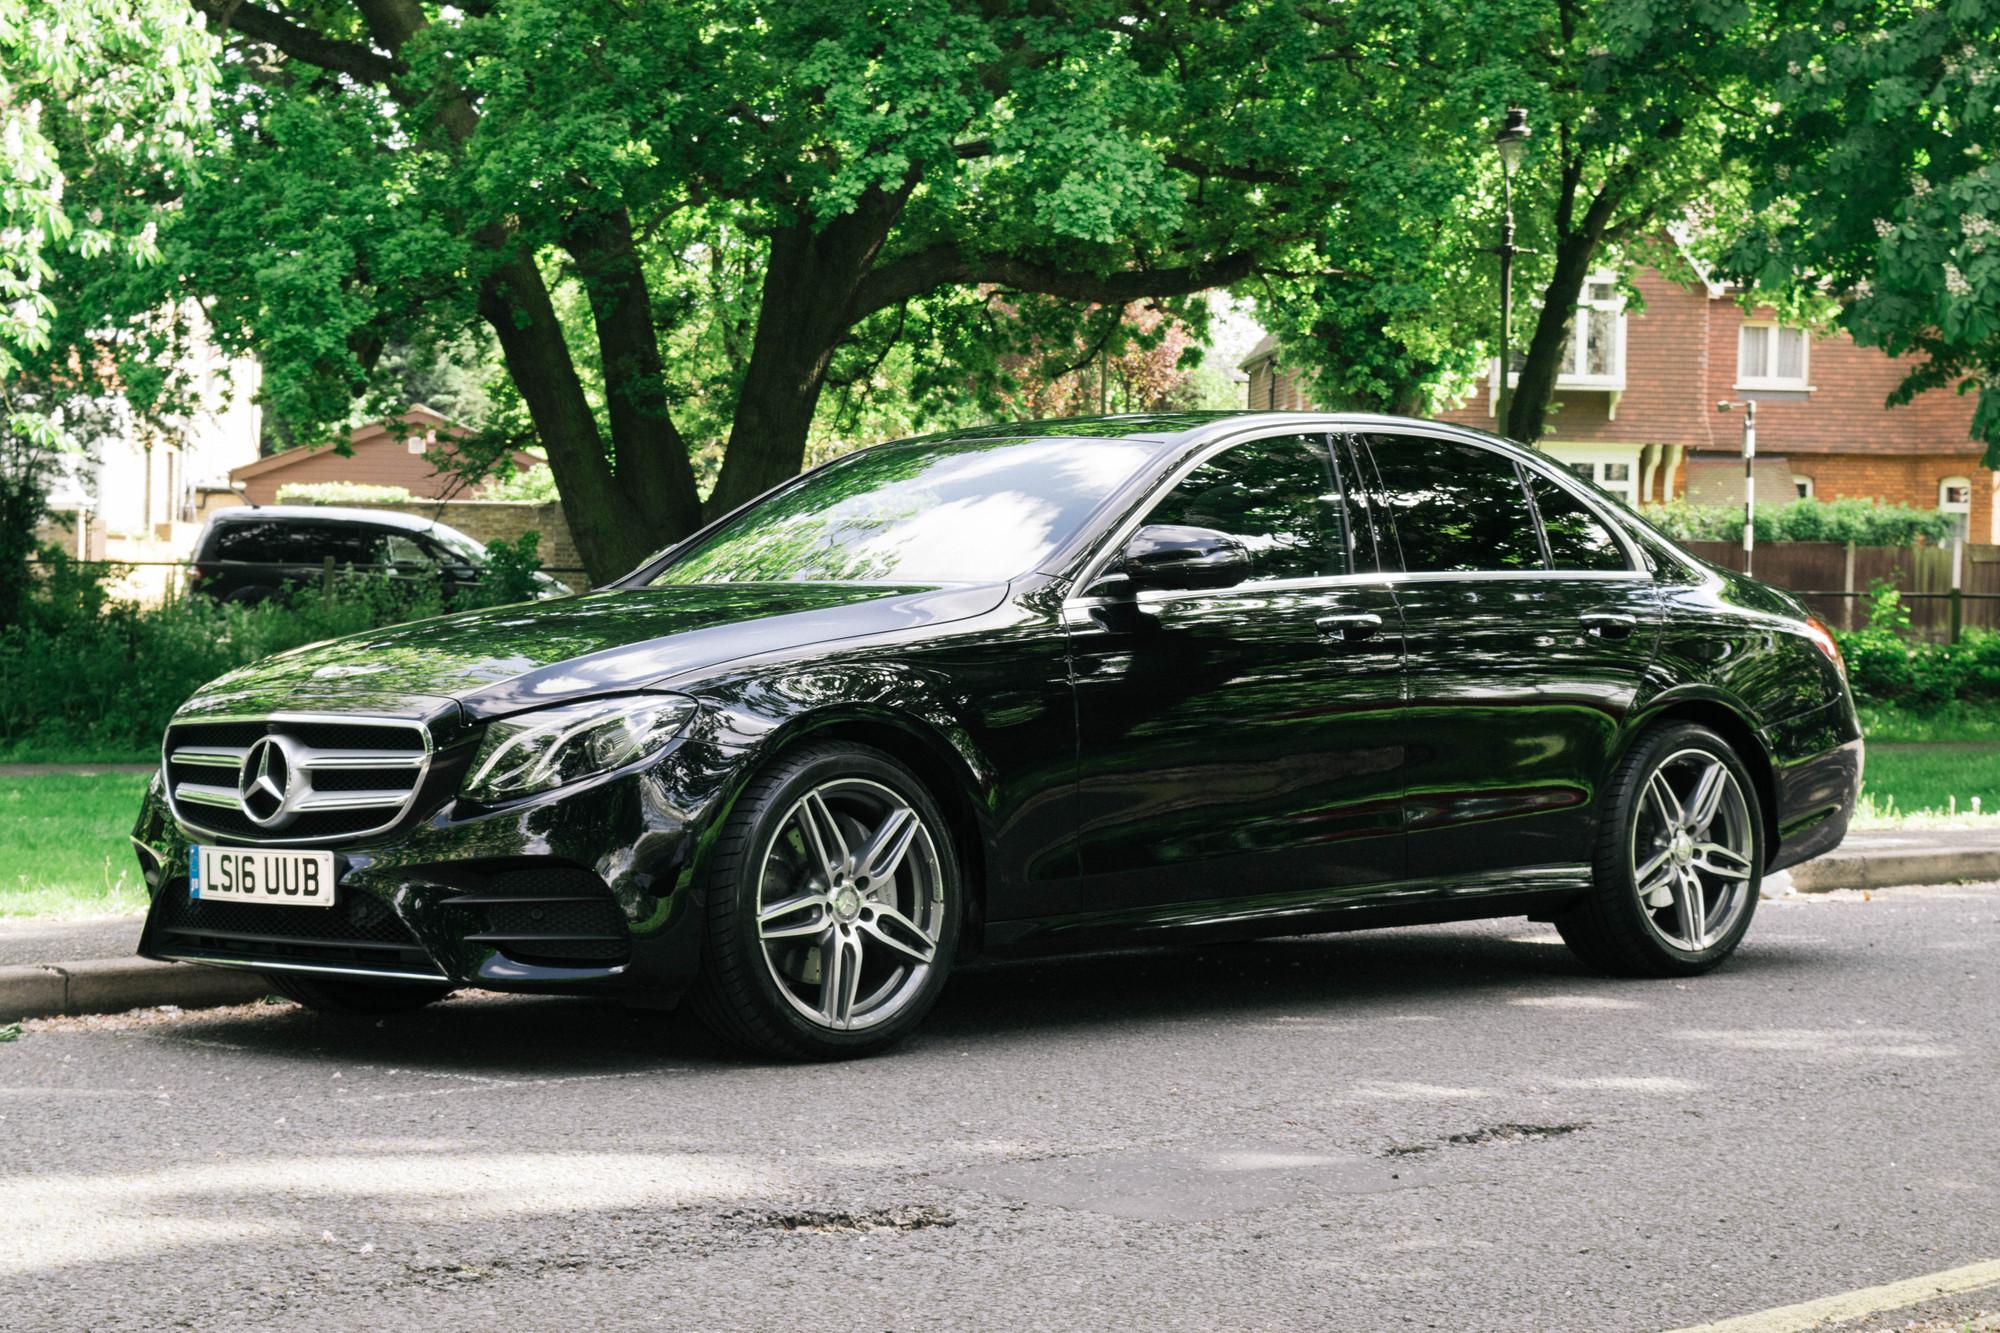 Mercedes benz e class car hire executive chauffeur car for London mercedes benz